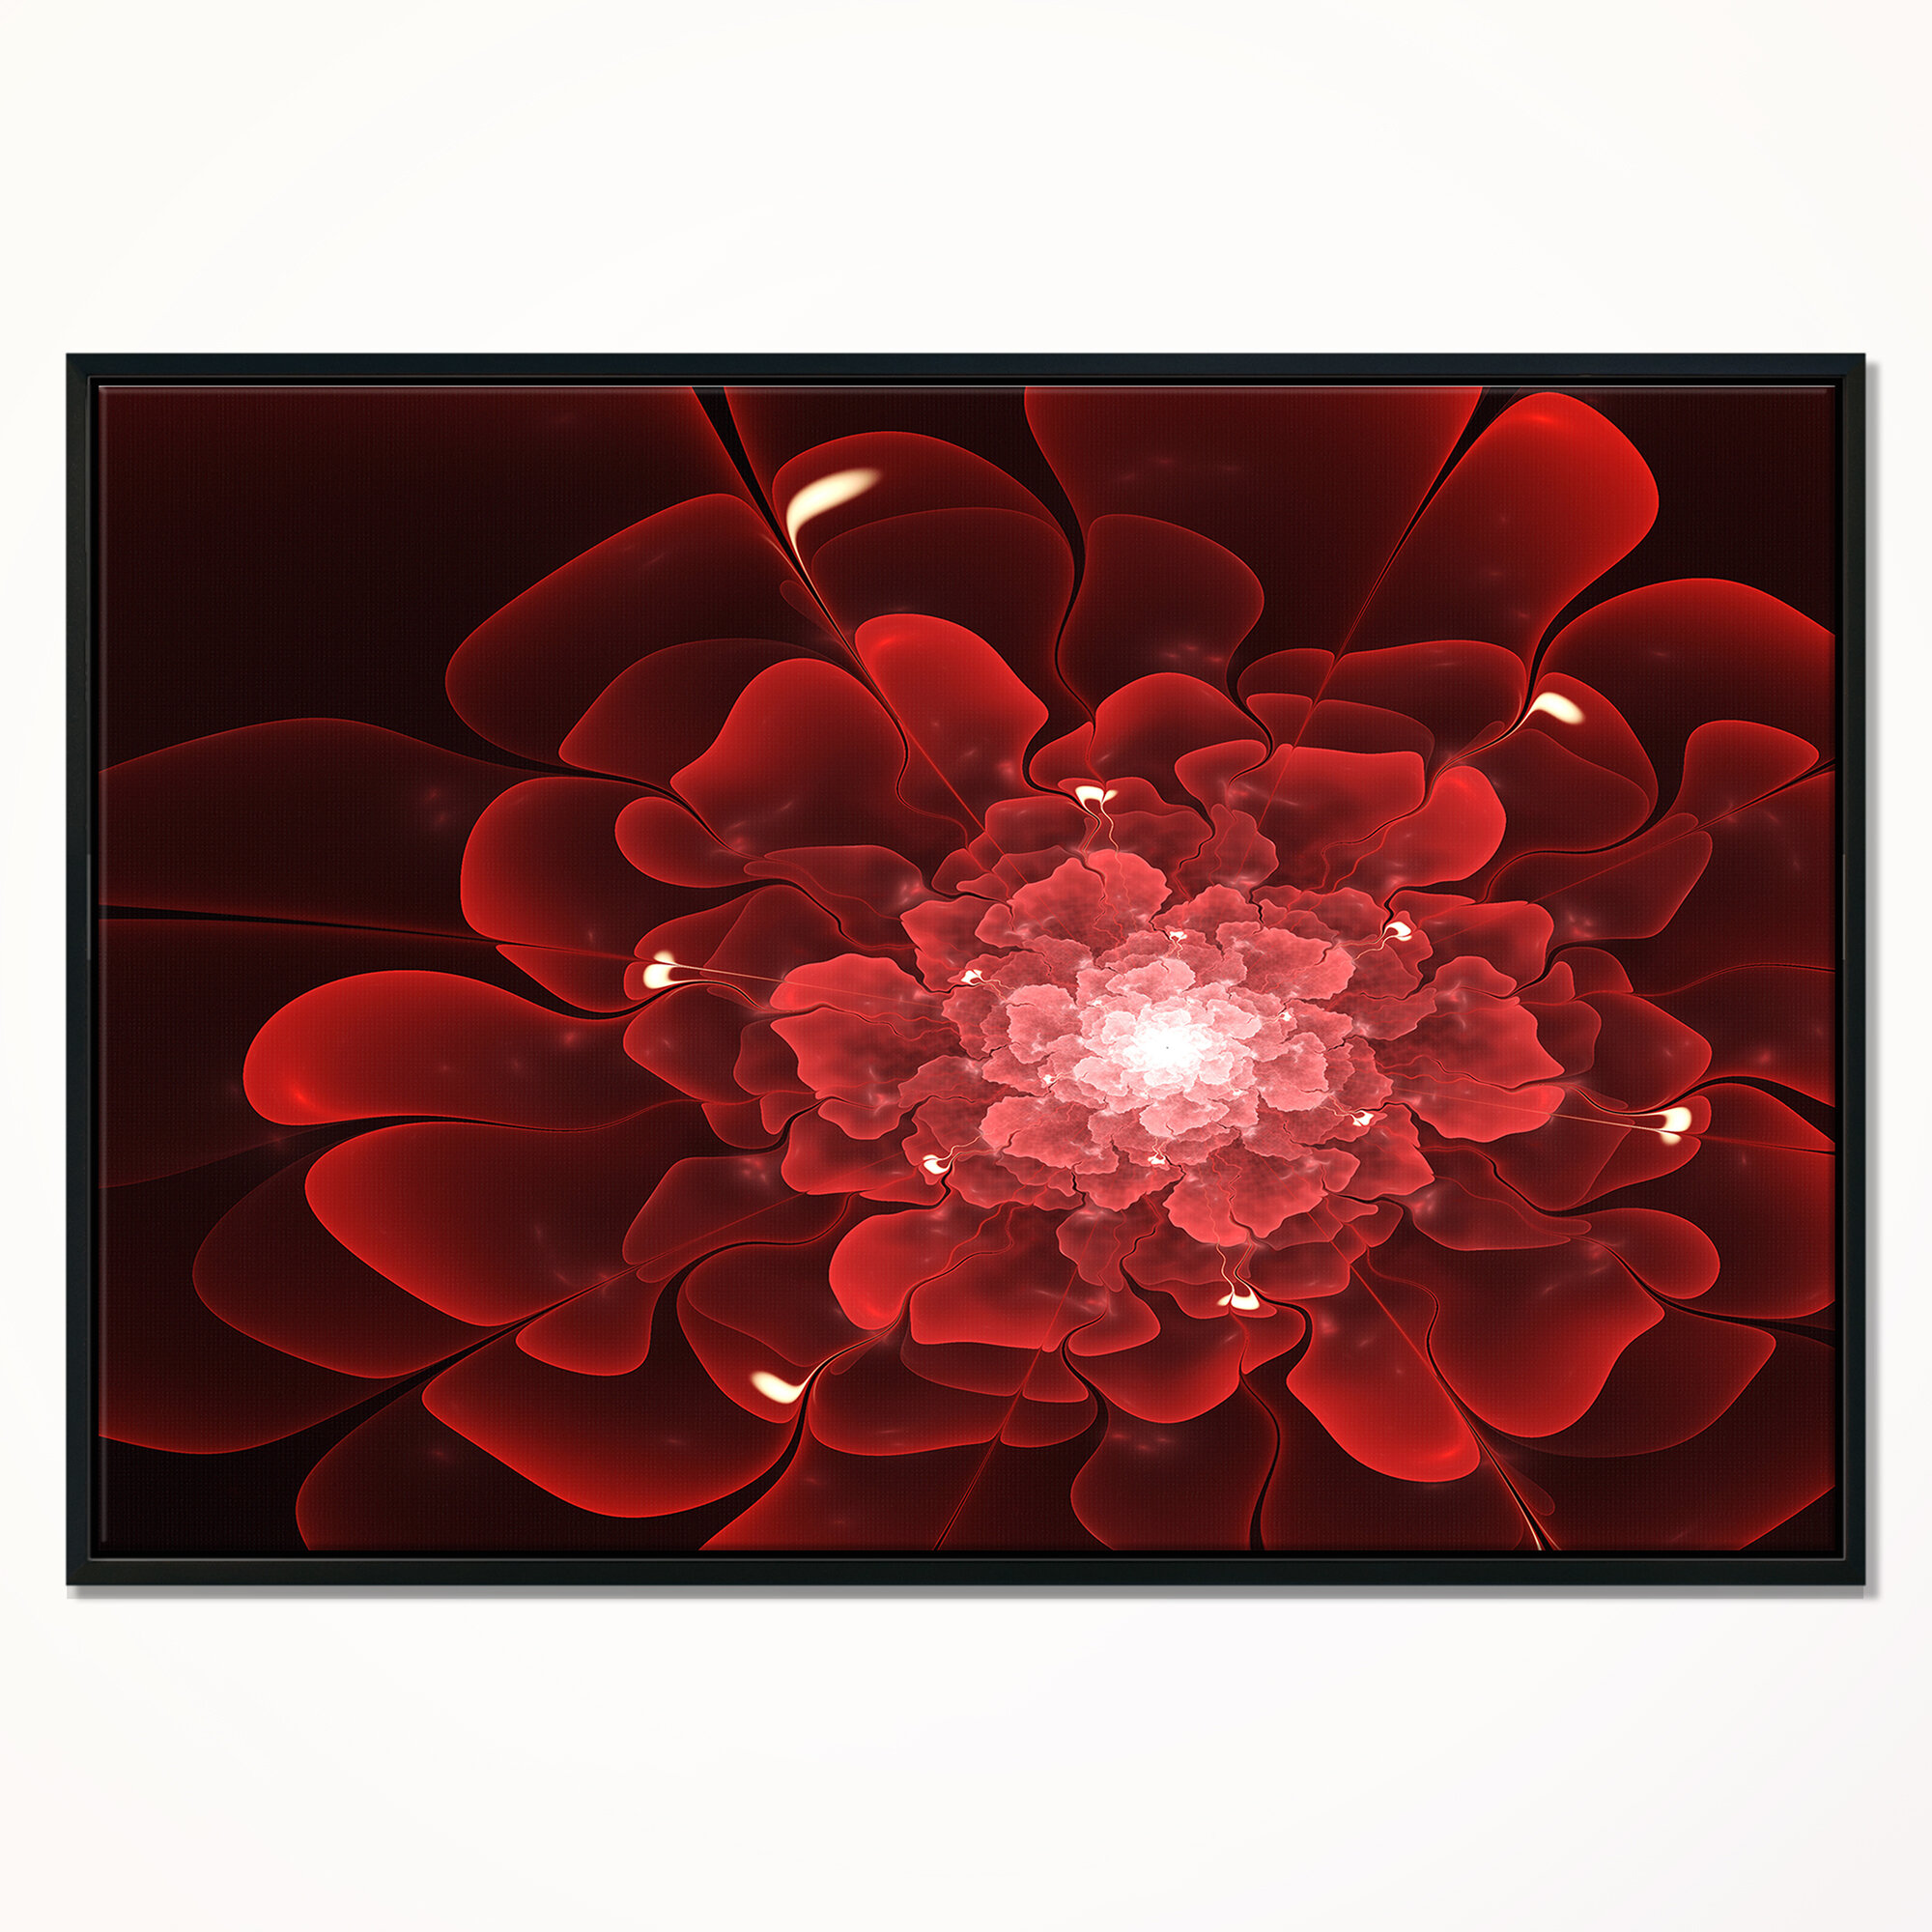 East Urban Home Fractal Flower Clear Red Digital Art Framed Graphic Art Print On Wrapped Canvas Wayfair